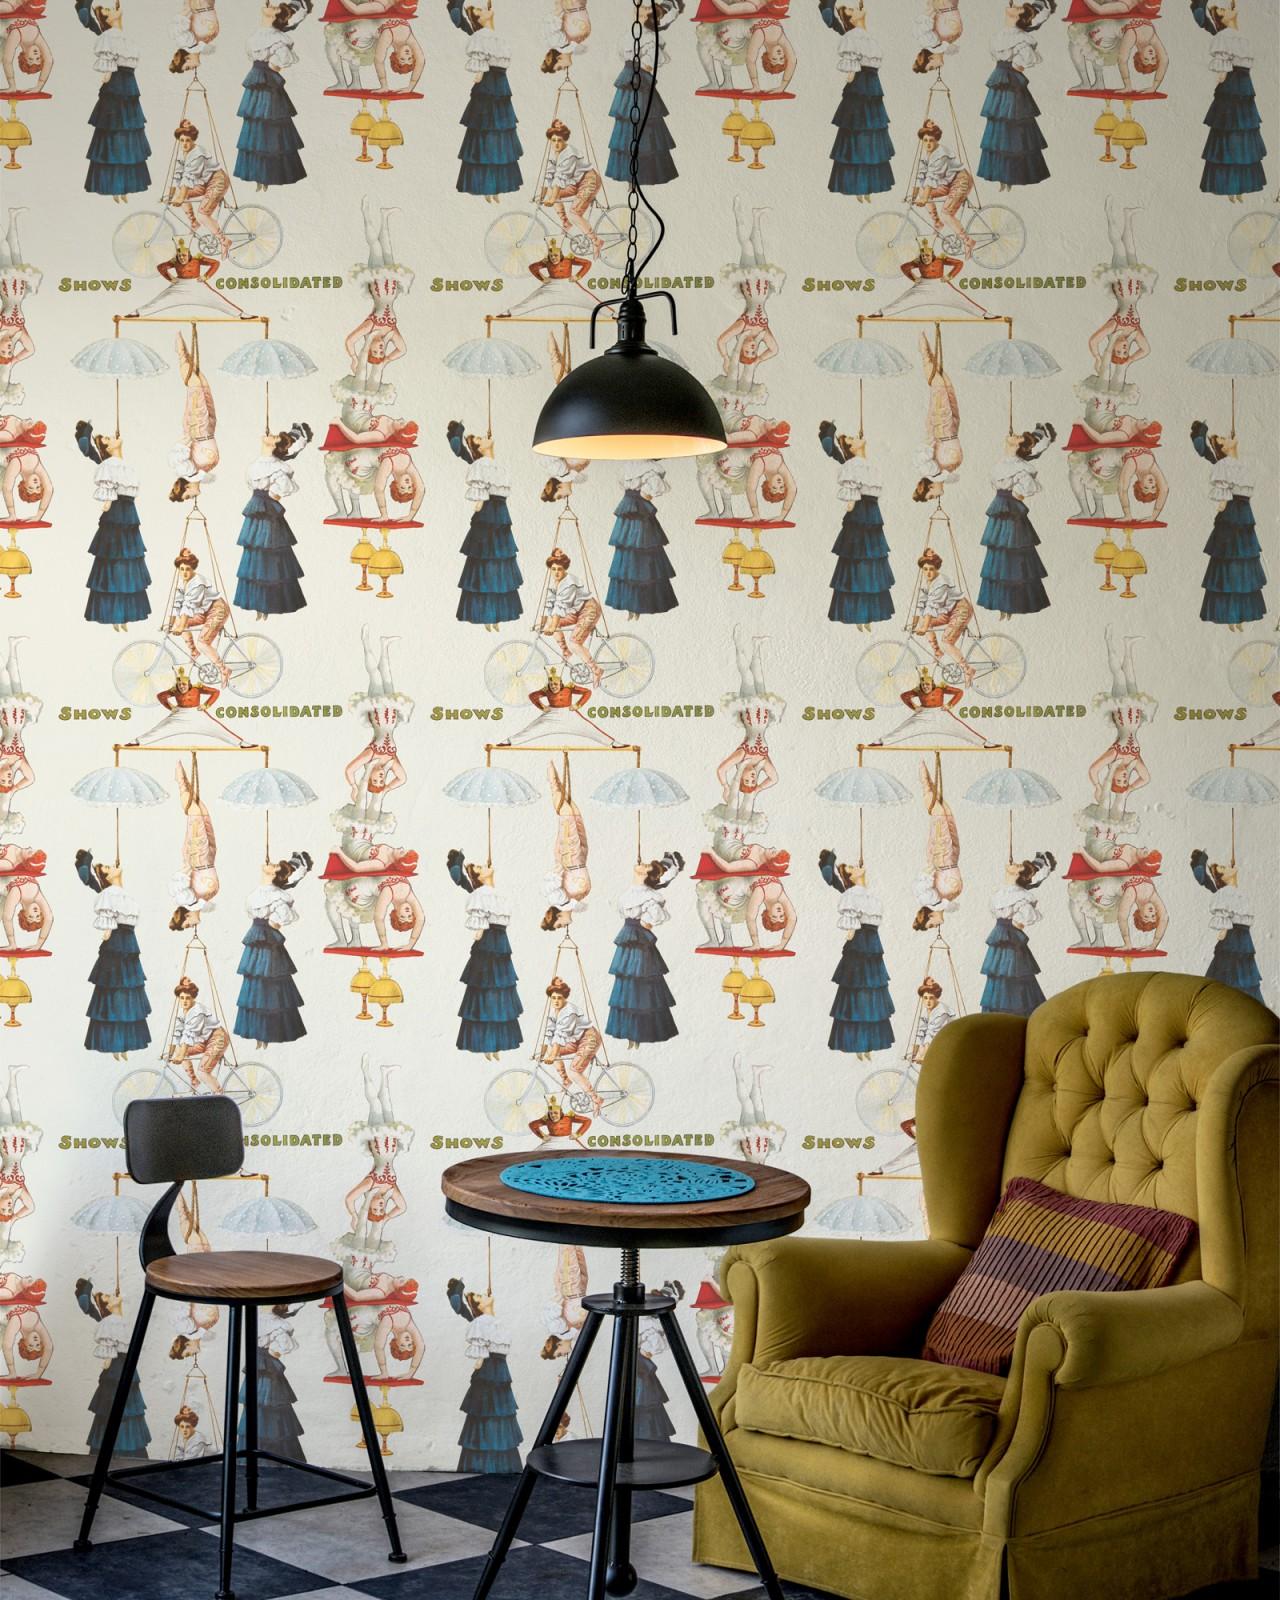 THE GREAT SHOW Premium Wallpaper